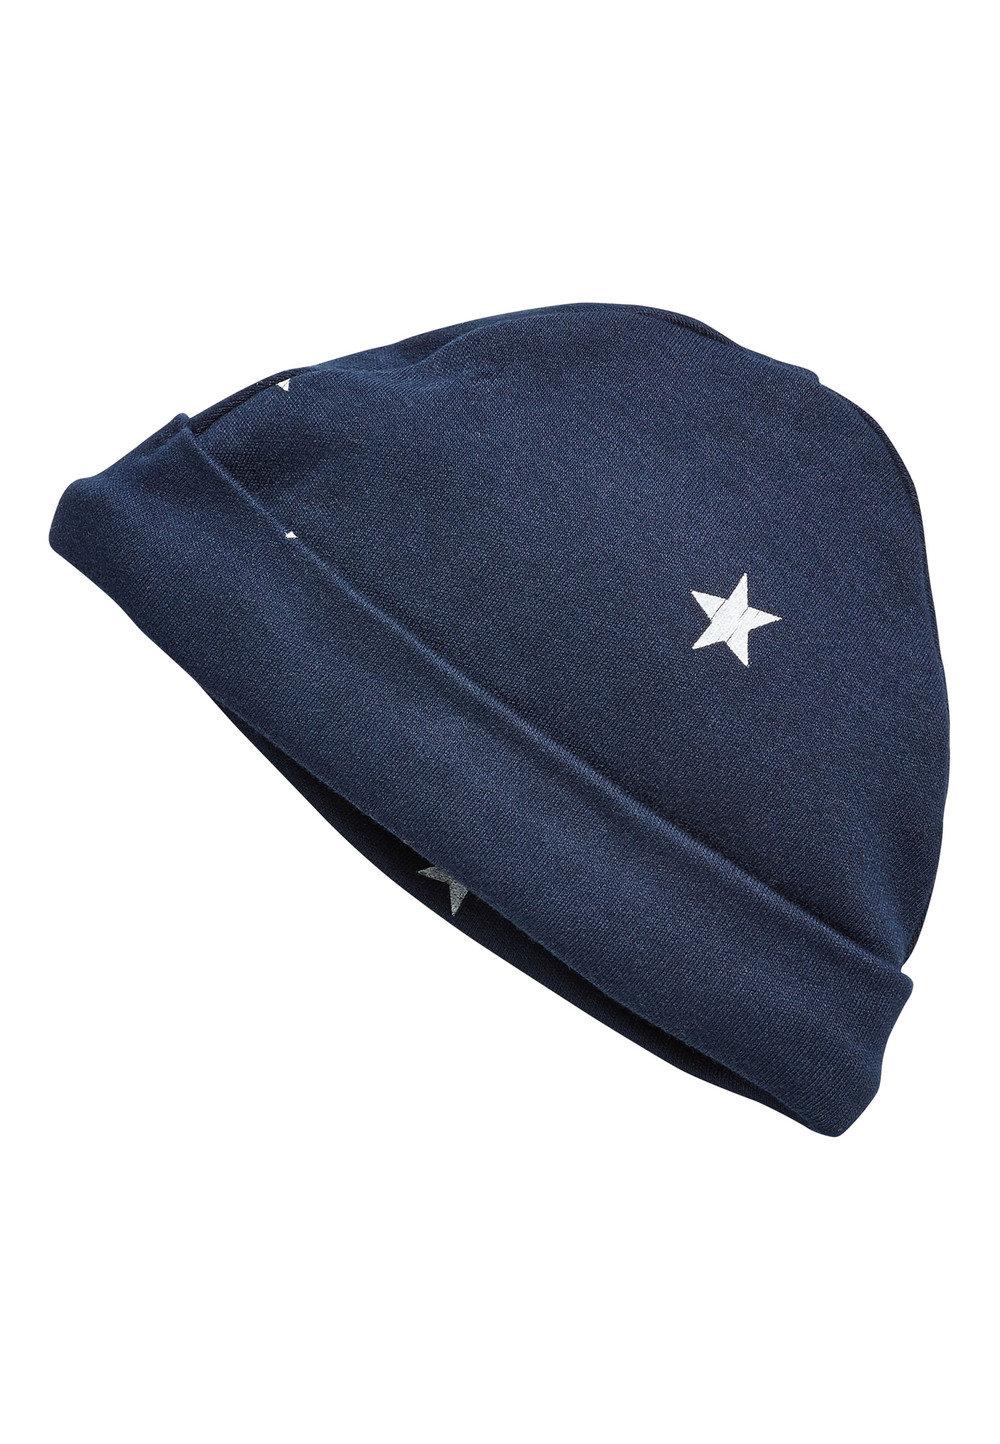 cb2bb2c642d Next Stripe Star Print Beanie Hats Two Pack (0-18mths) Online